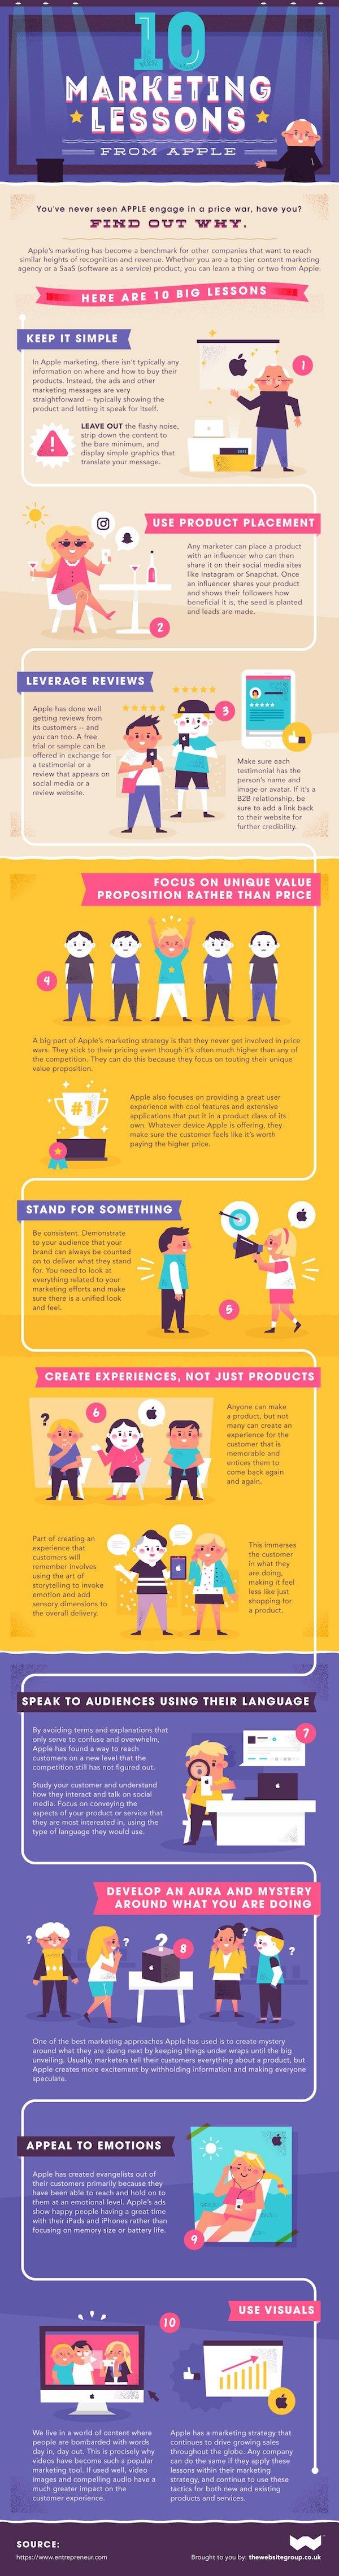 10 leçons marketing d'Apple